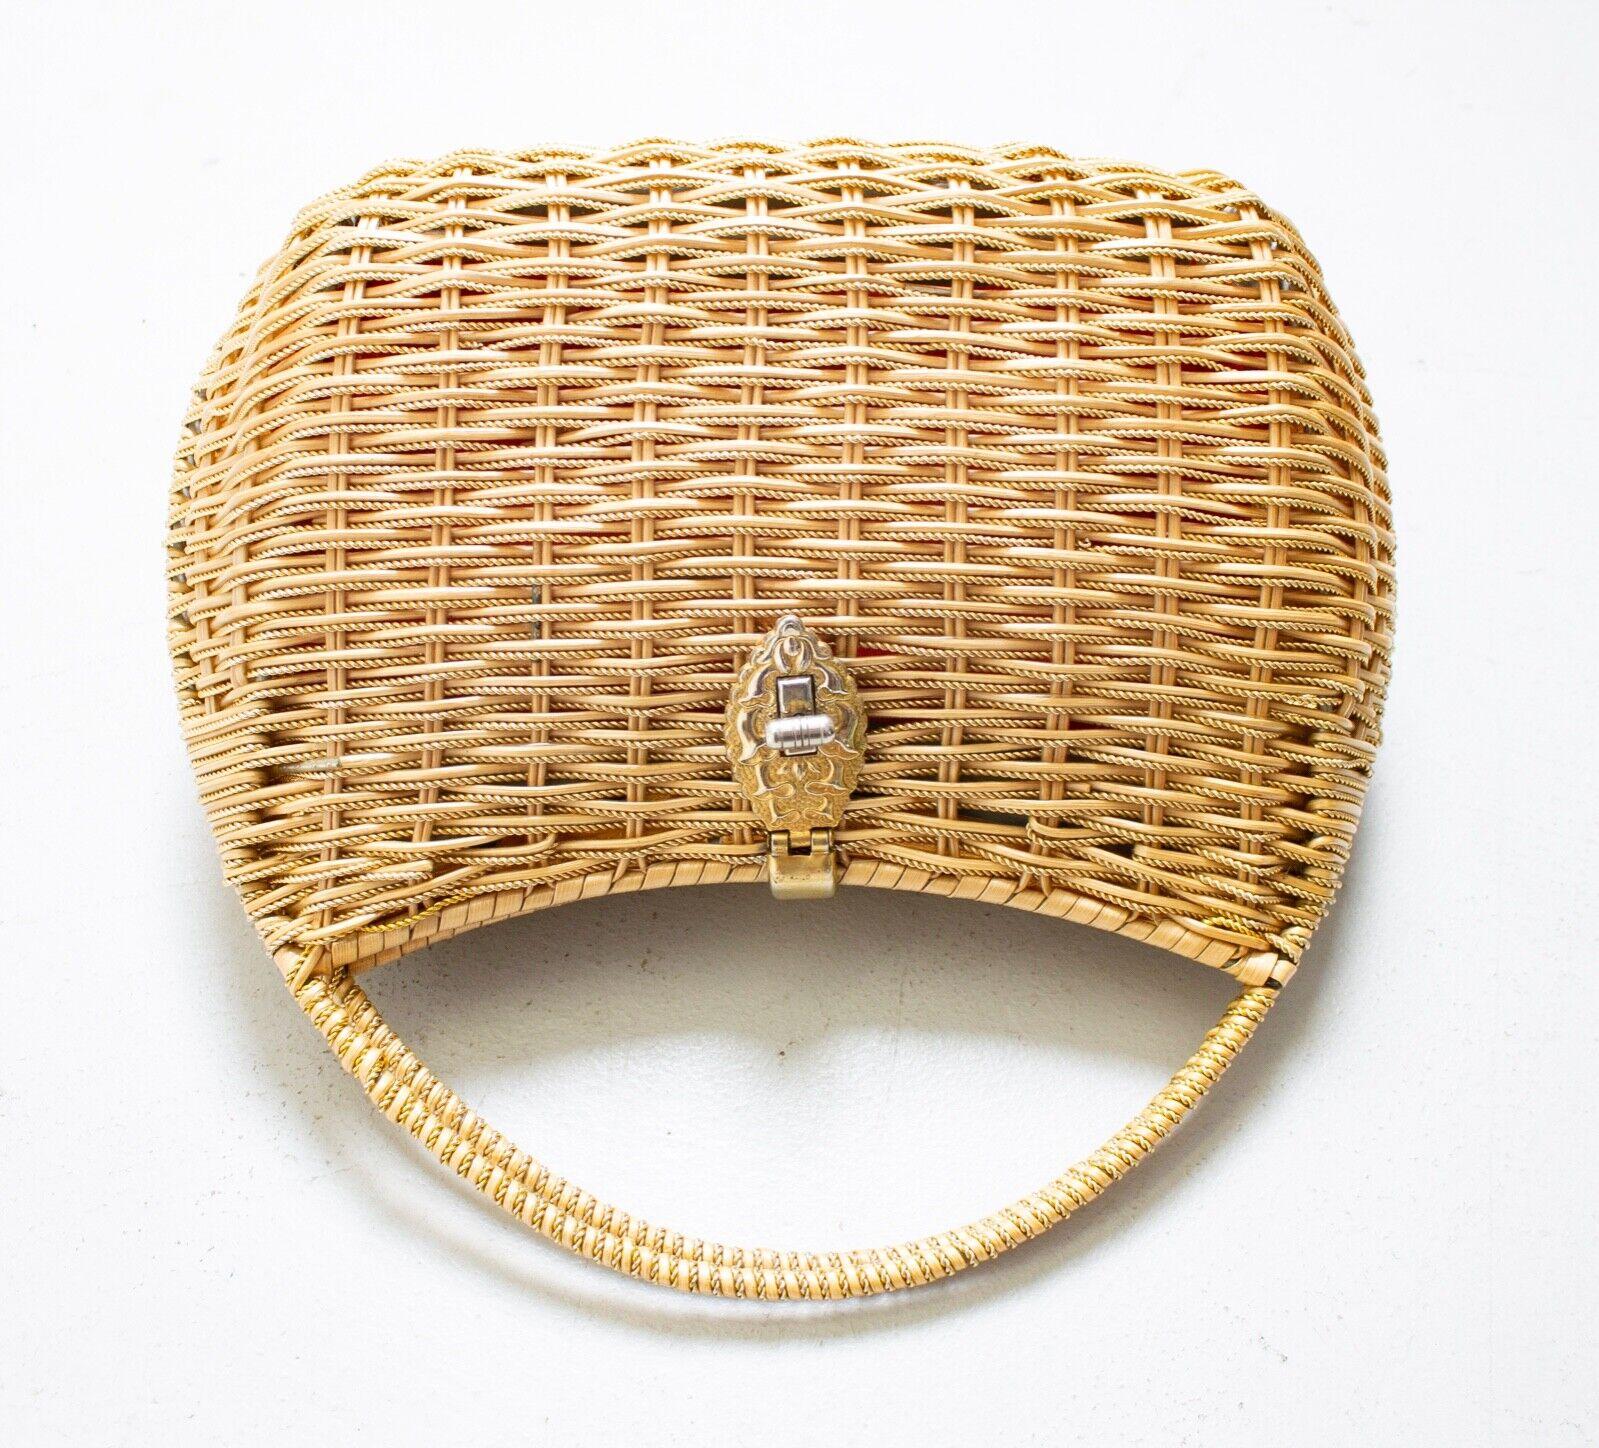 Vintage Basket Purse 1960s Gold Metal Woven Wicke… - image 5